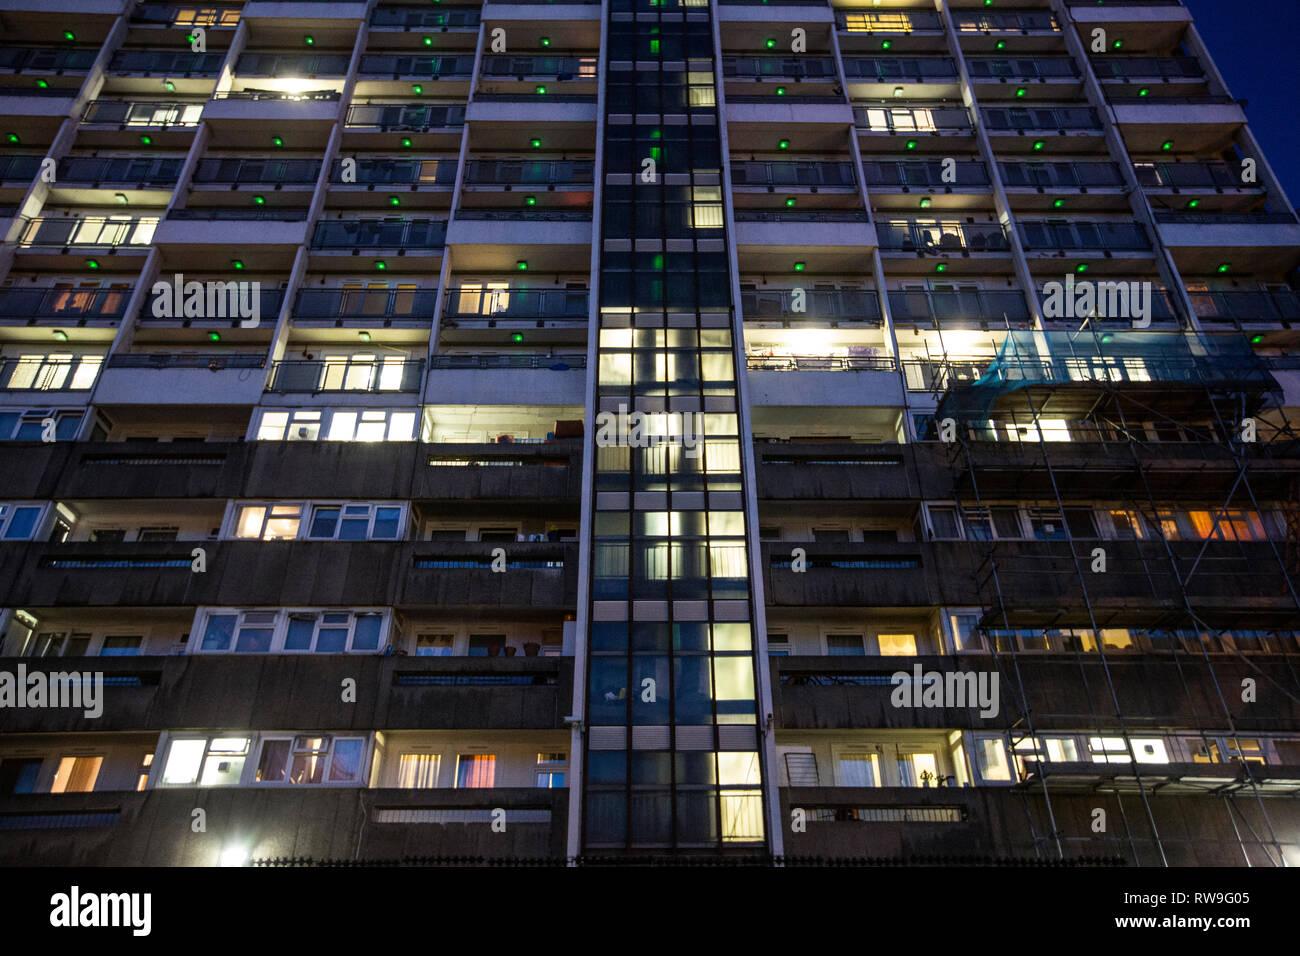 Social Housing blocks at twilight, Fellows Court, Weymouth Terrace, Hoxton, East London, England, United Kingdom. - Stock Image